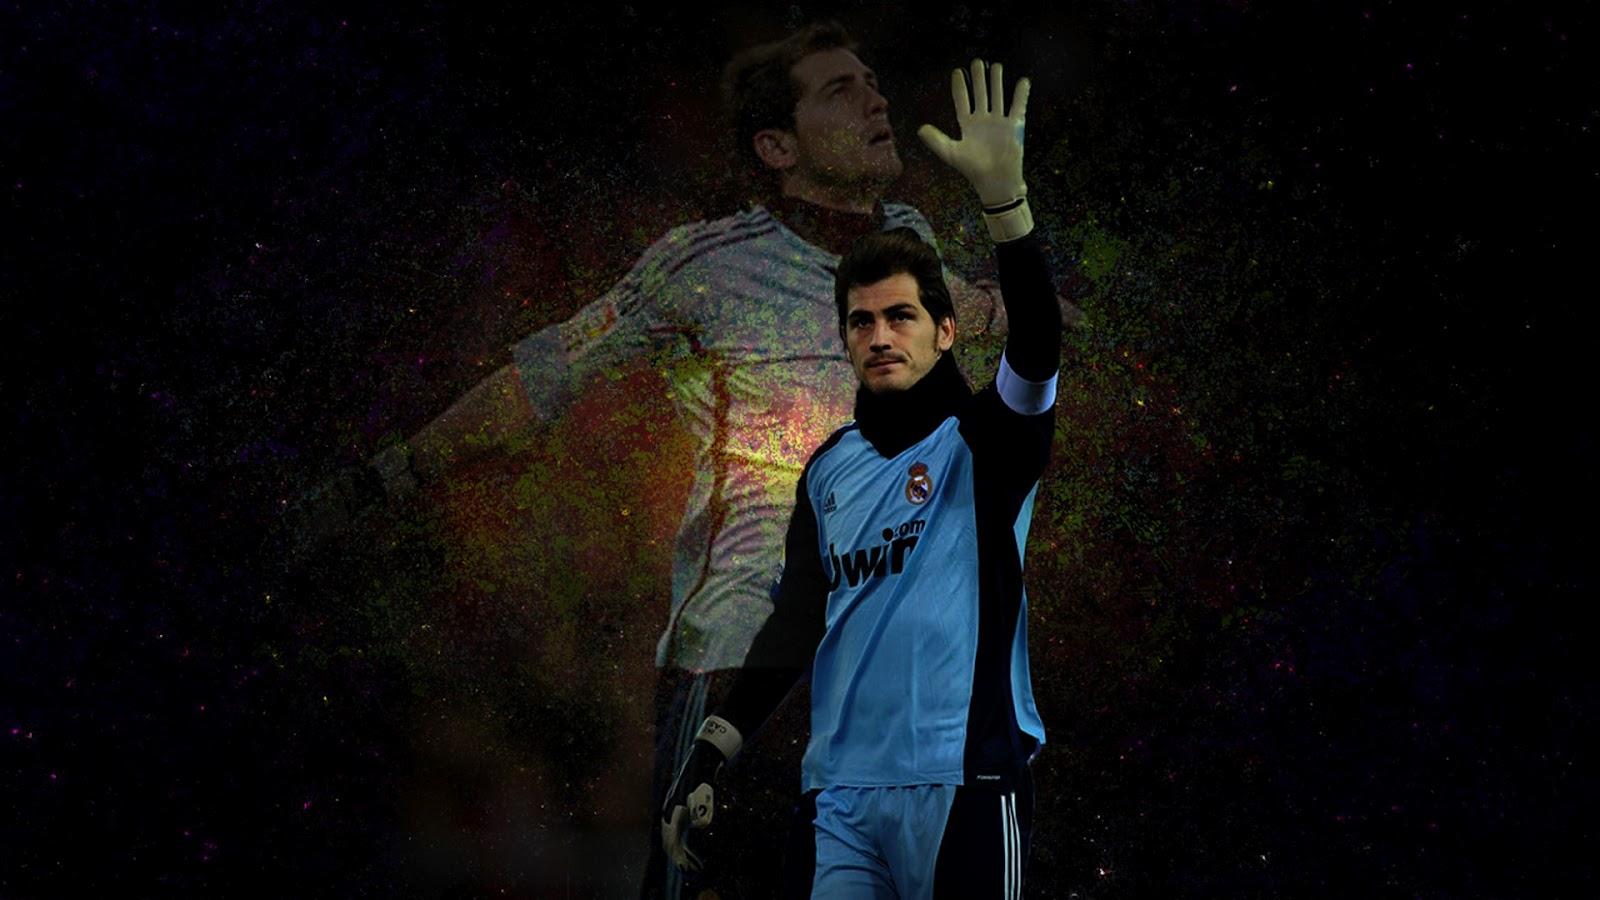 http://3.bp.blogspot.com/-b3705NuH2VA/T50BbU3dWyI/AAAAAAAAEg4/fSHB0pwAx_s/s1600/Iker-Casillas-iker-casillas-835a4cd685-1920x1080.jpg